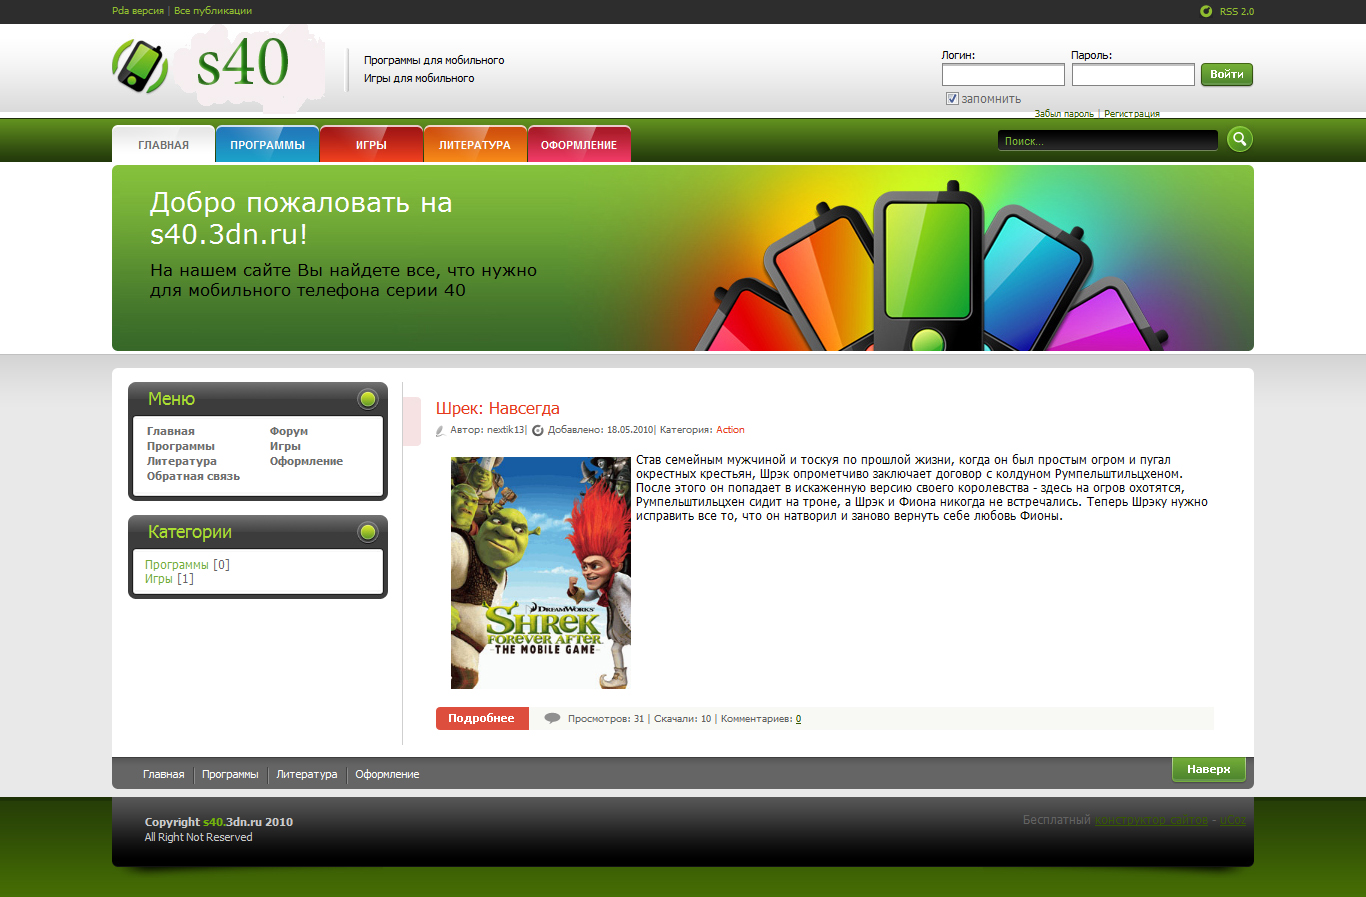 Green шаблон для сайтов ucoz который